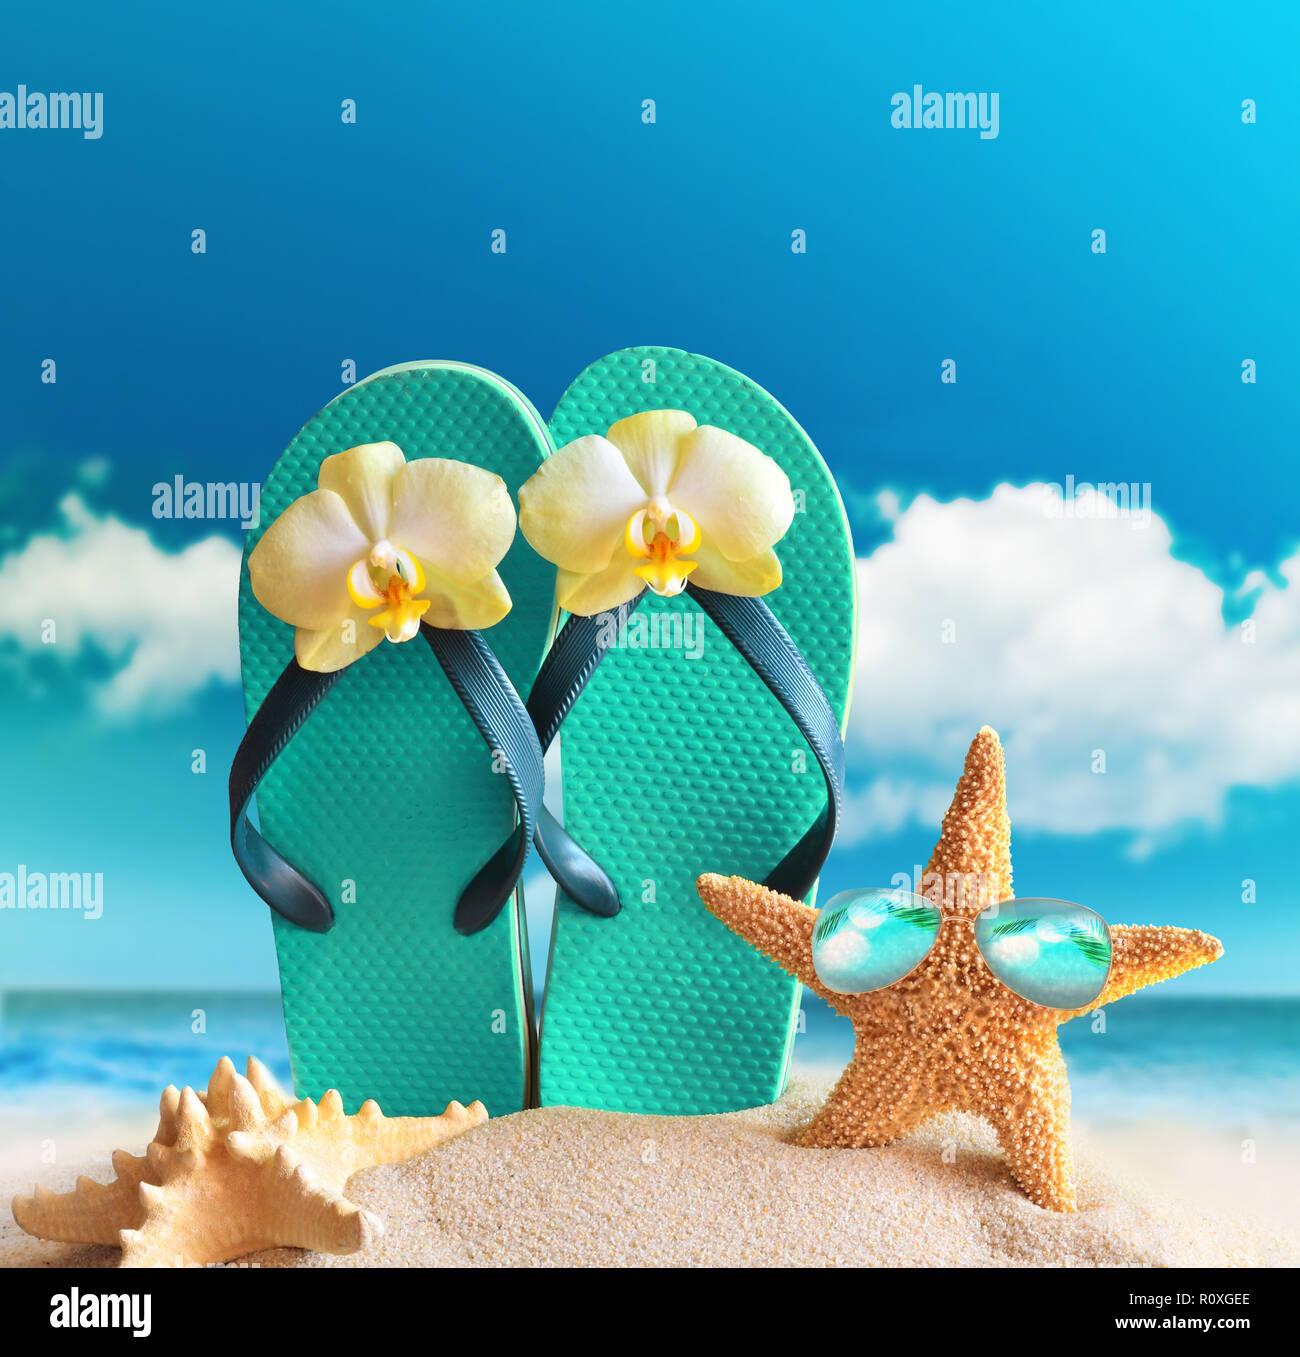 72e5c8c099723e Flip-flops